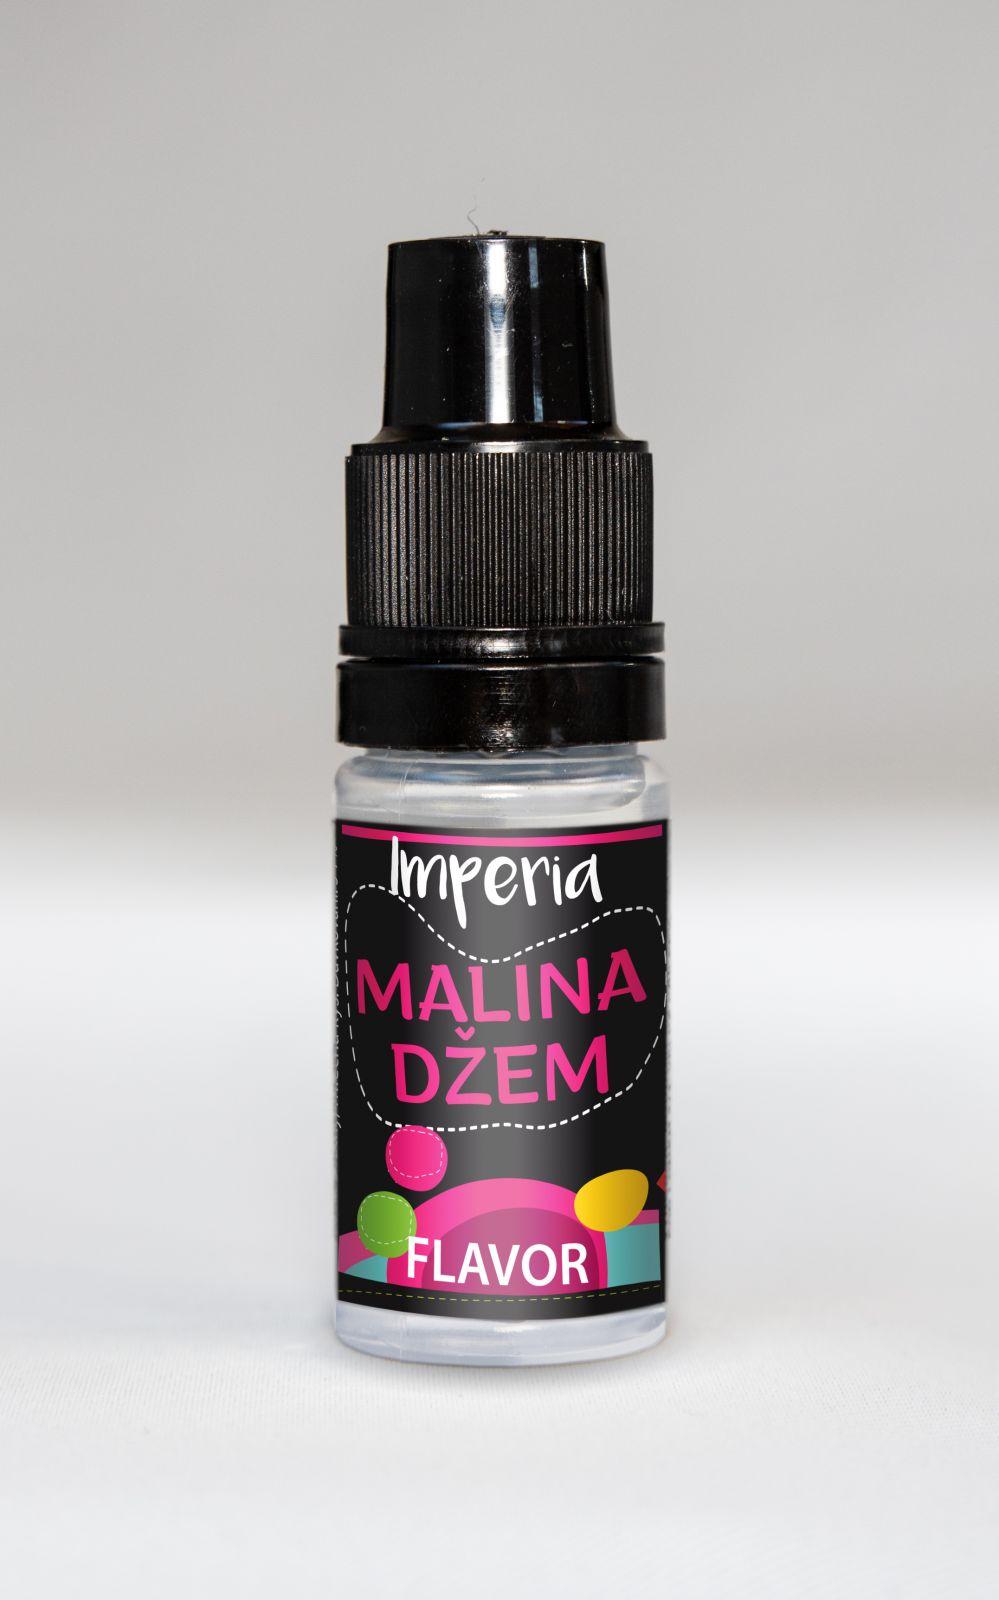 MALINA DŽEM - Aroma Imperia Black Label Boudoir Samadhi s.r.o.